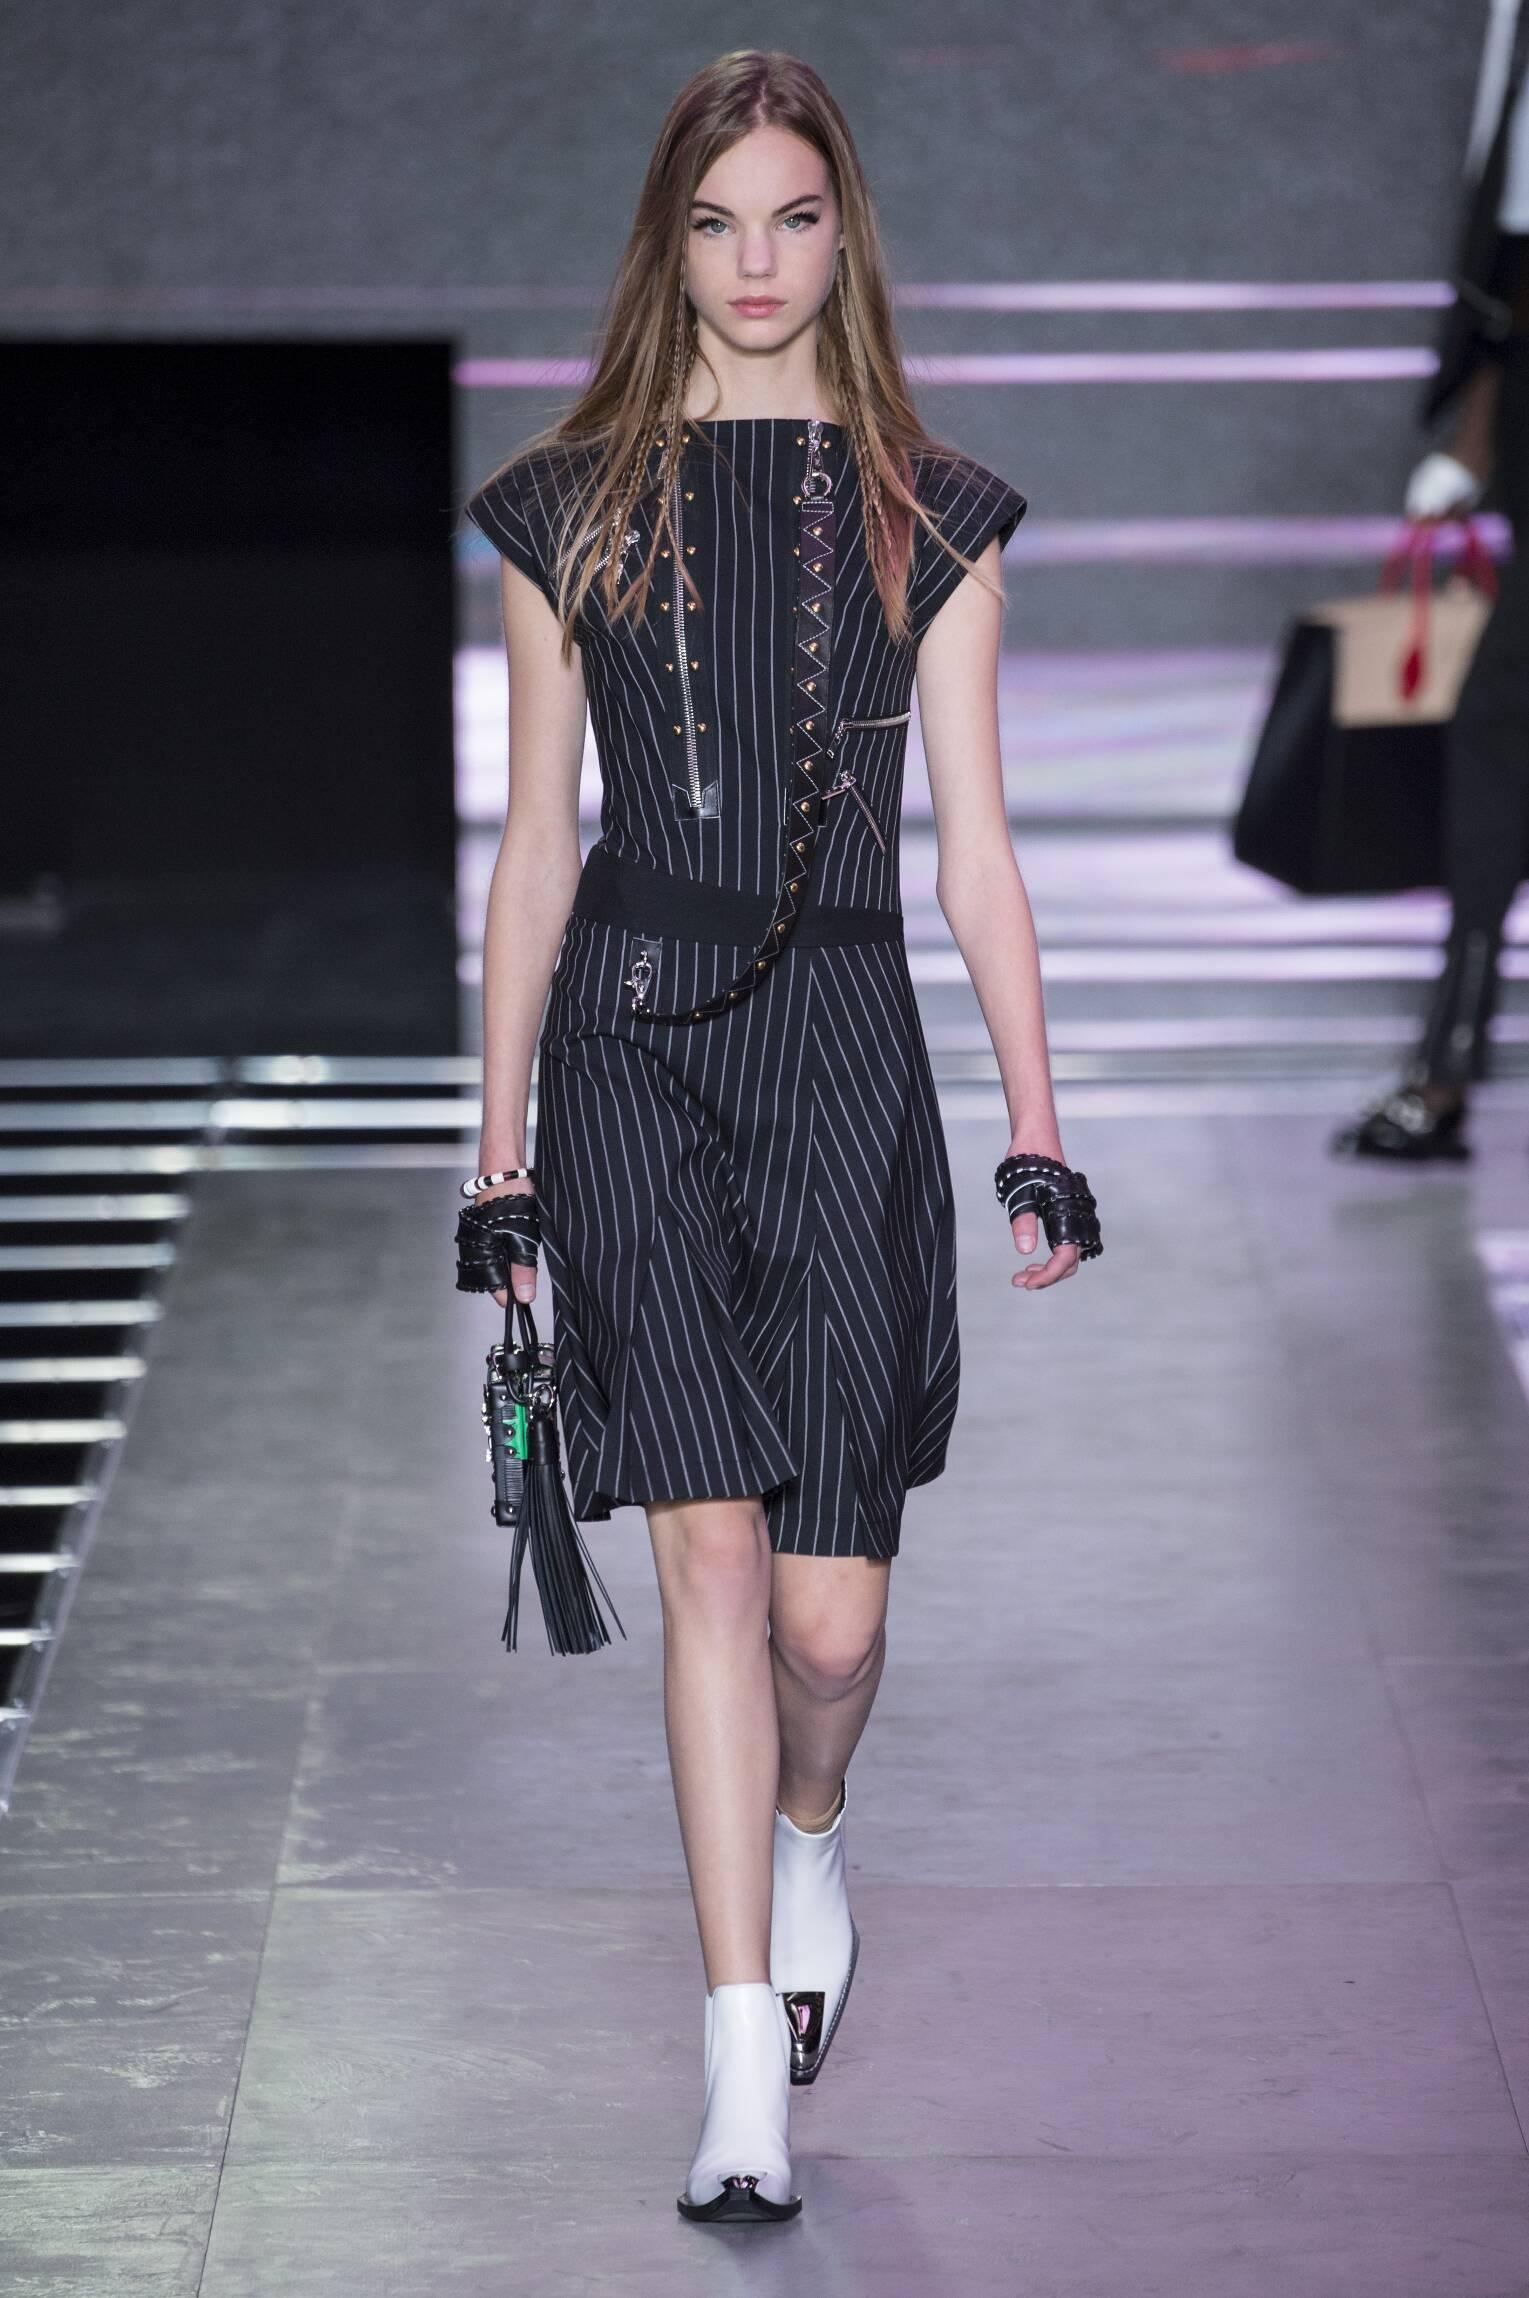 Louis Vuitton SS 2016 Womenswear